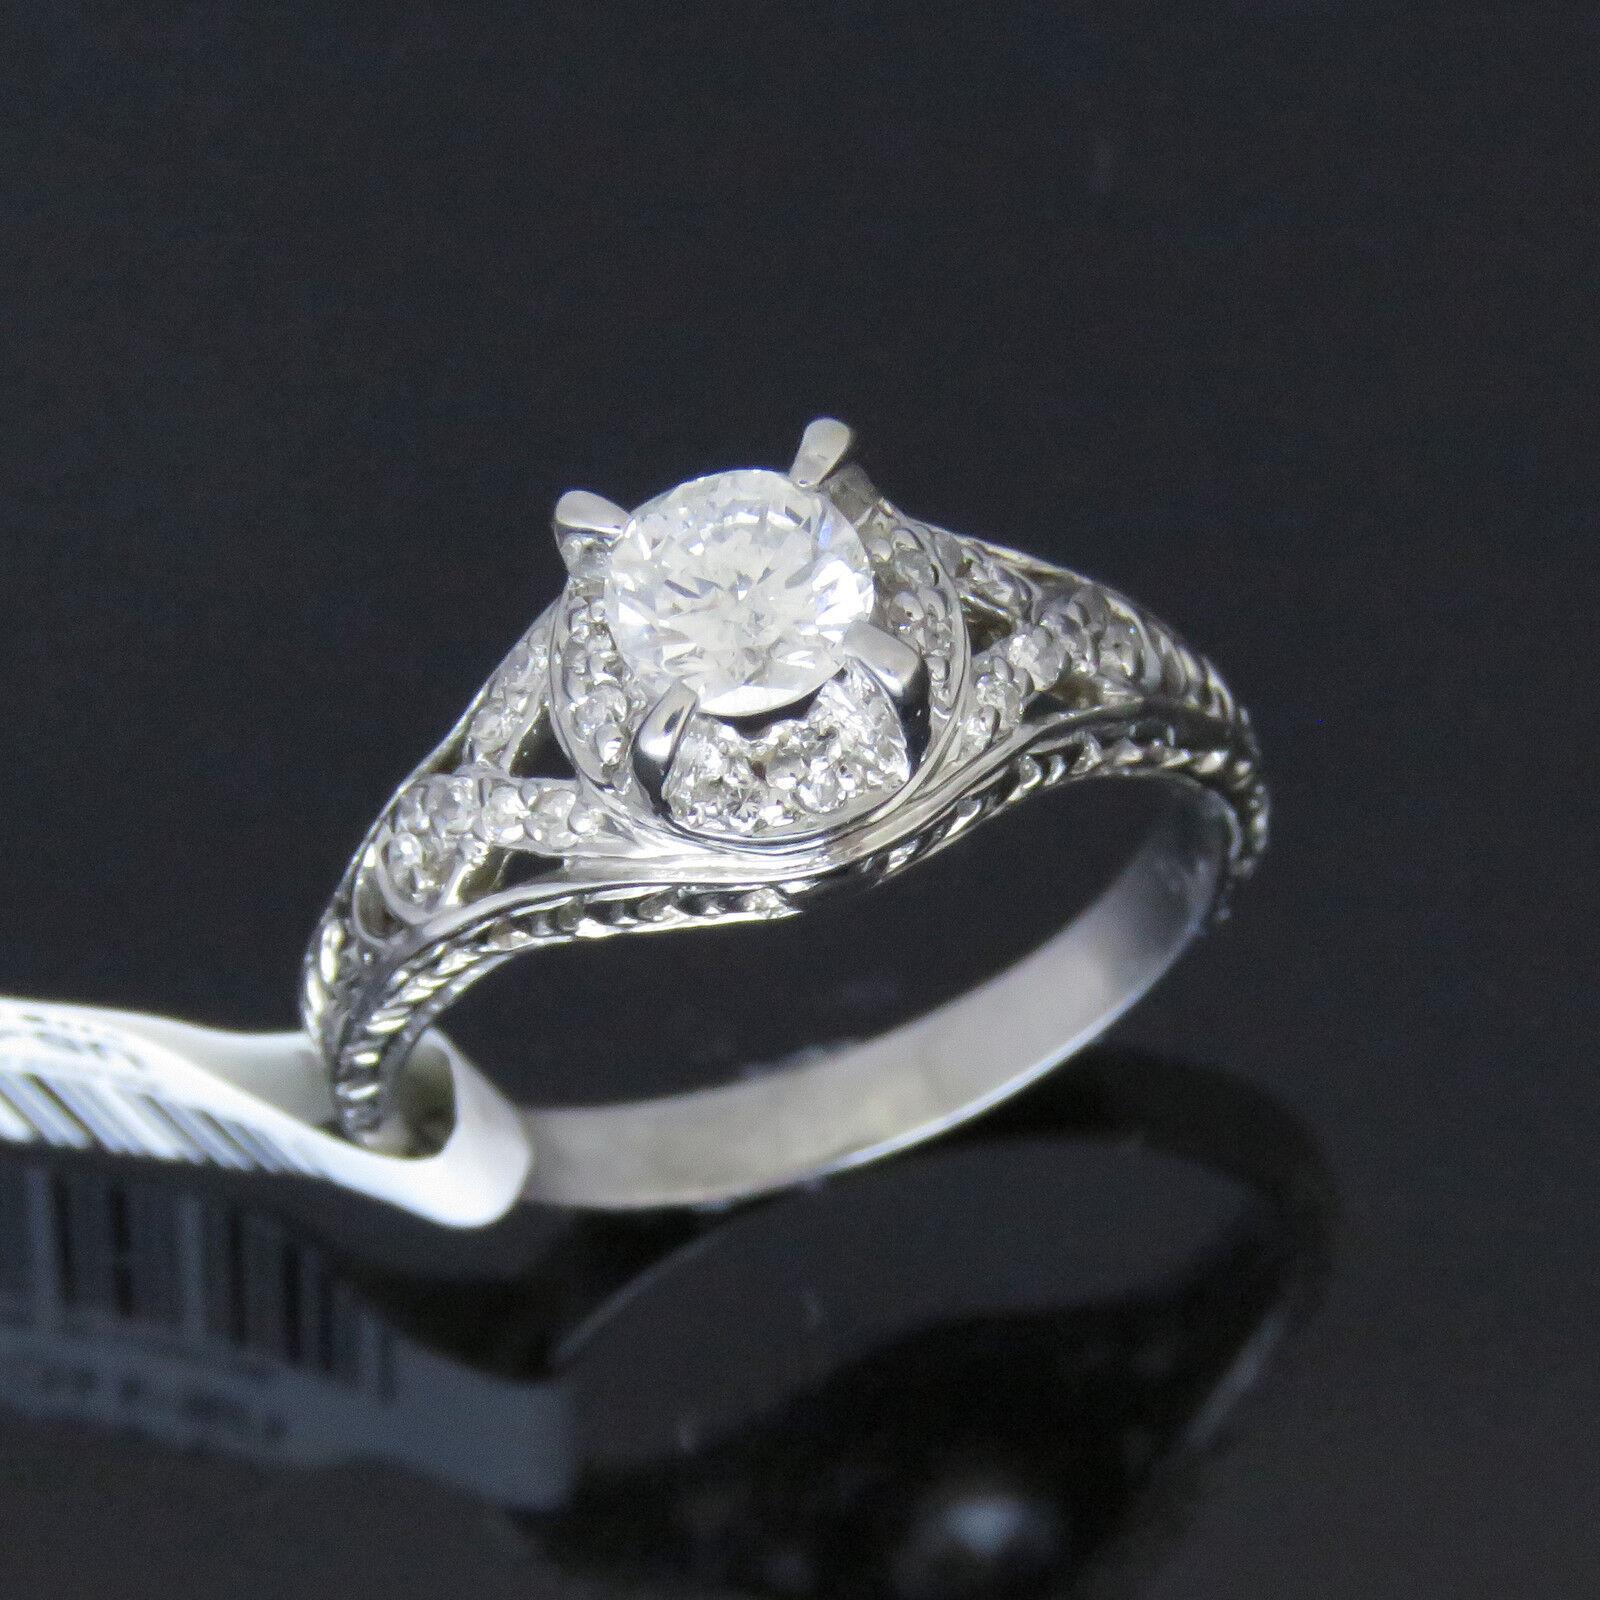 NYJEWEL 18k Solid gold Brand New Filigree 1ct Diamonds Engagement Ring